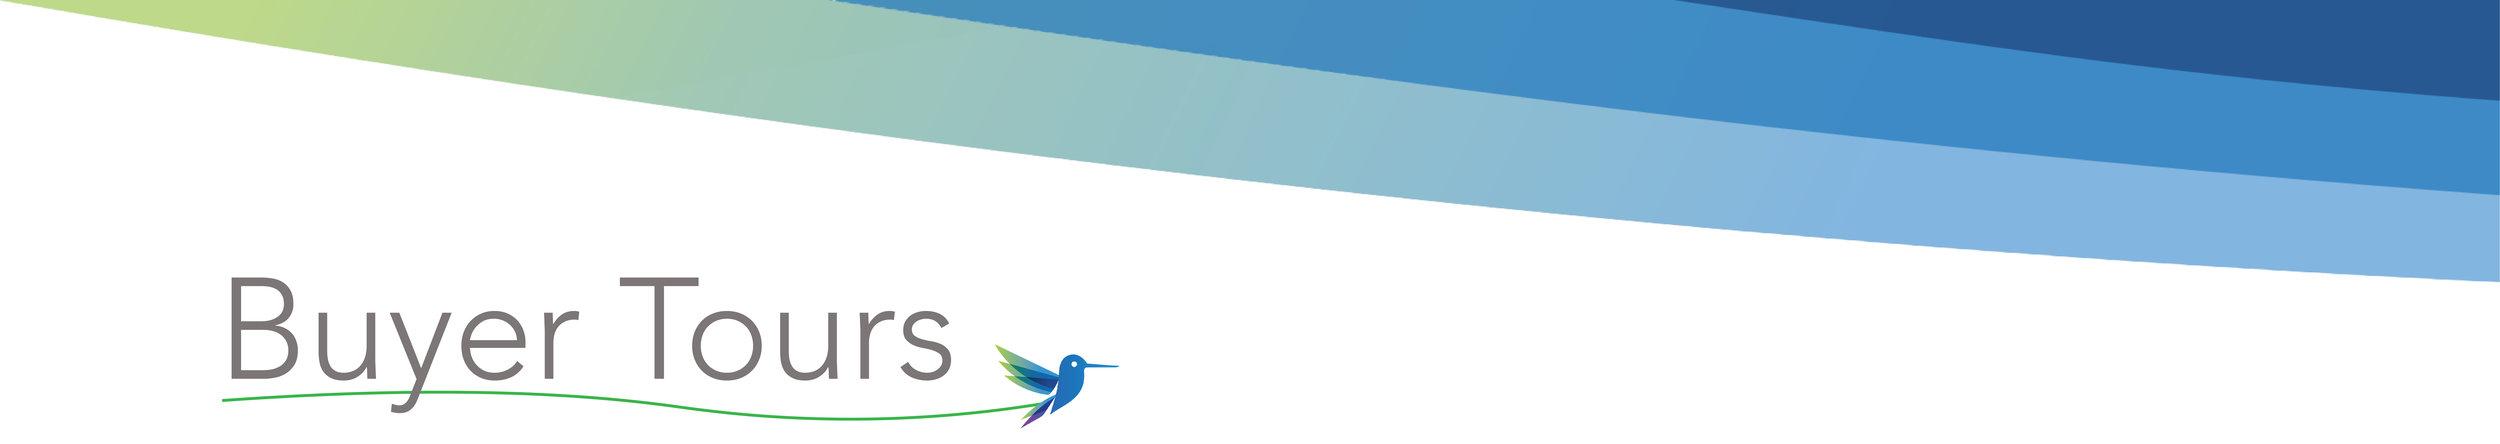 Buyer Tours Banner.jpg